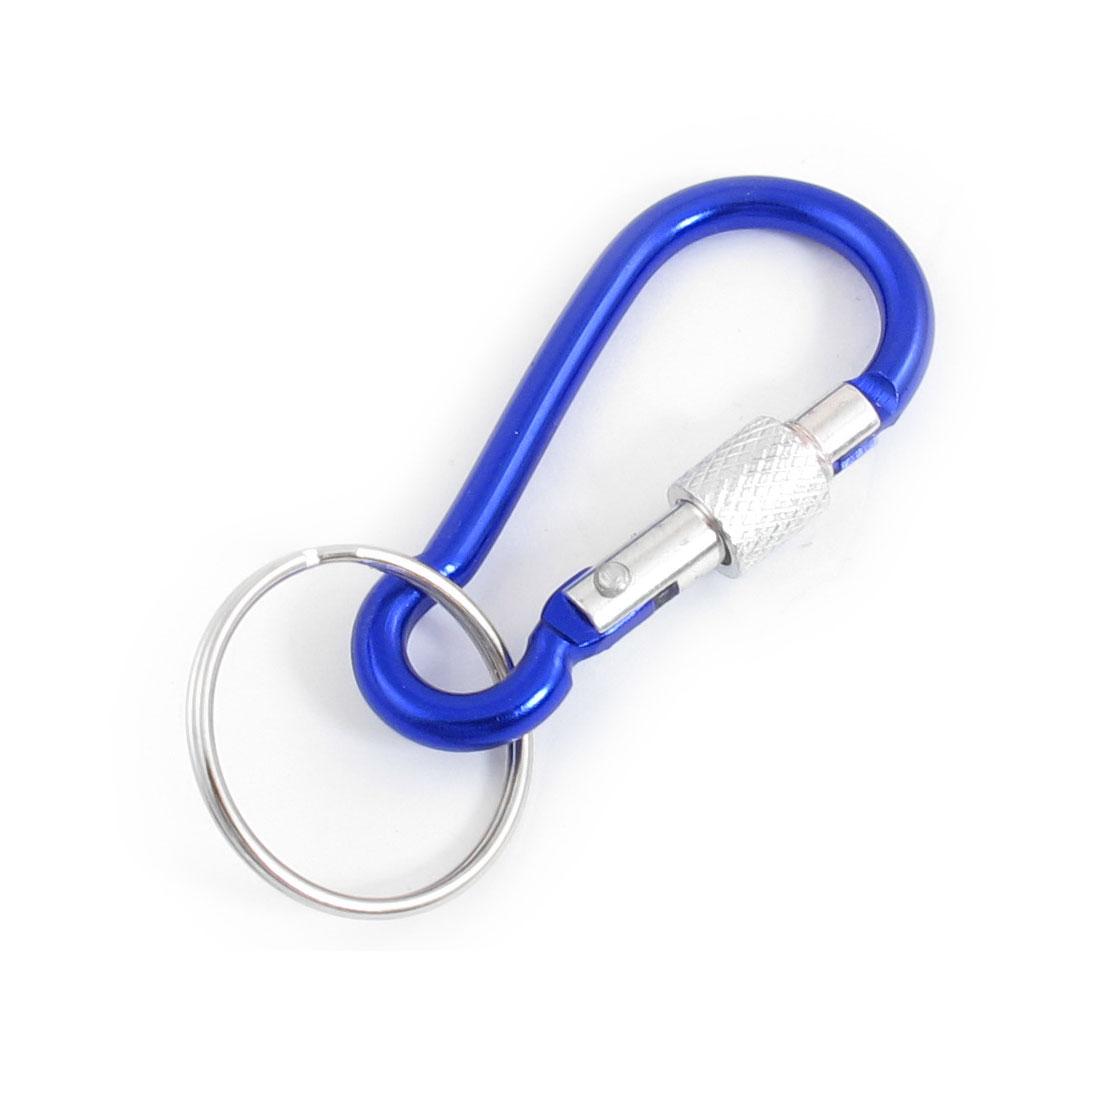 2 x Travel Spring Loaded Screw Lock 4.5mm Dia Dark Blue Carabiner Hook w Key Ring